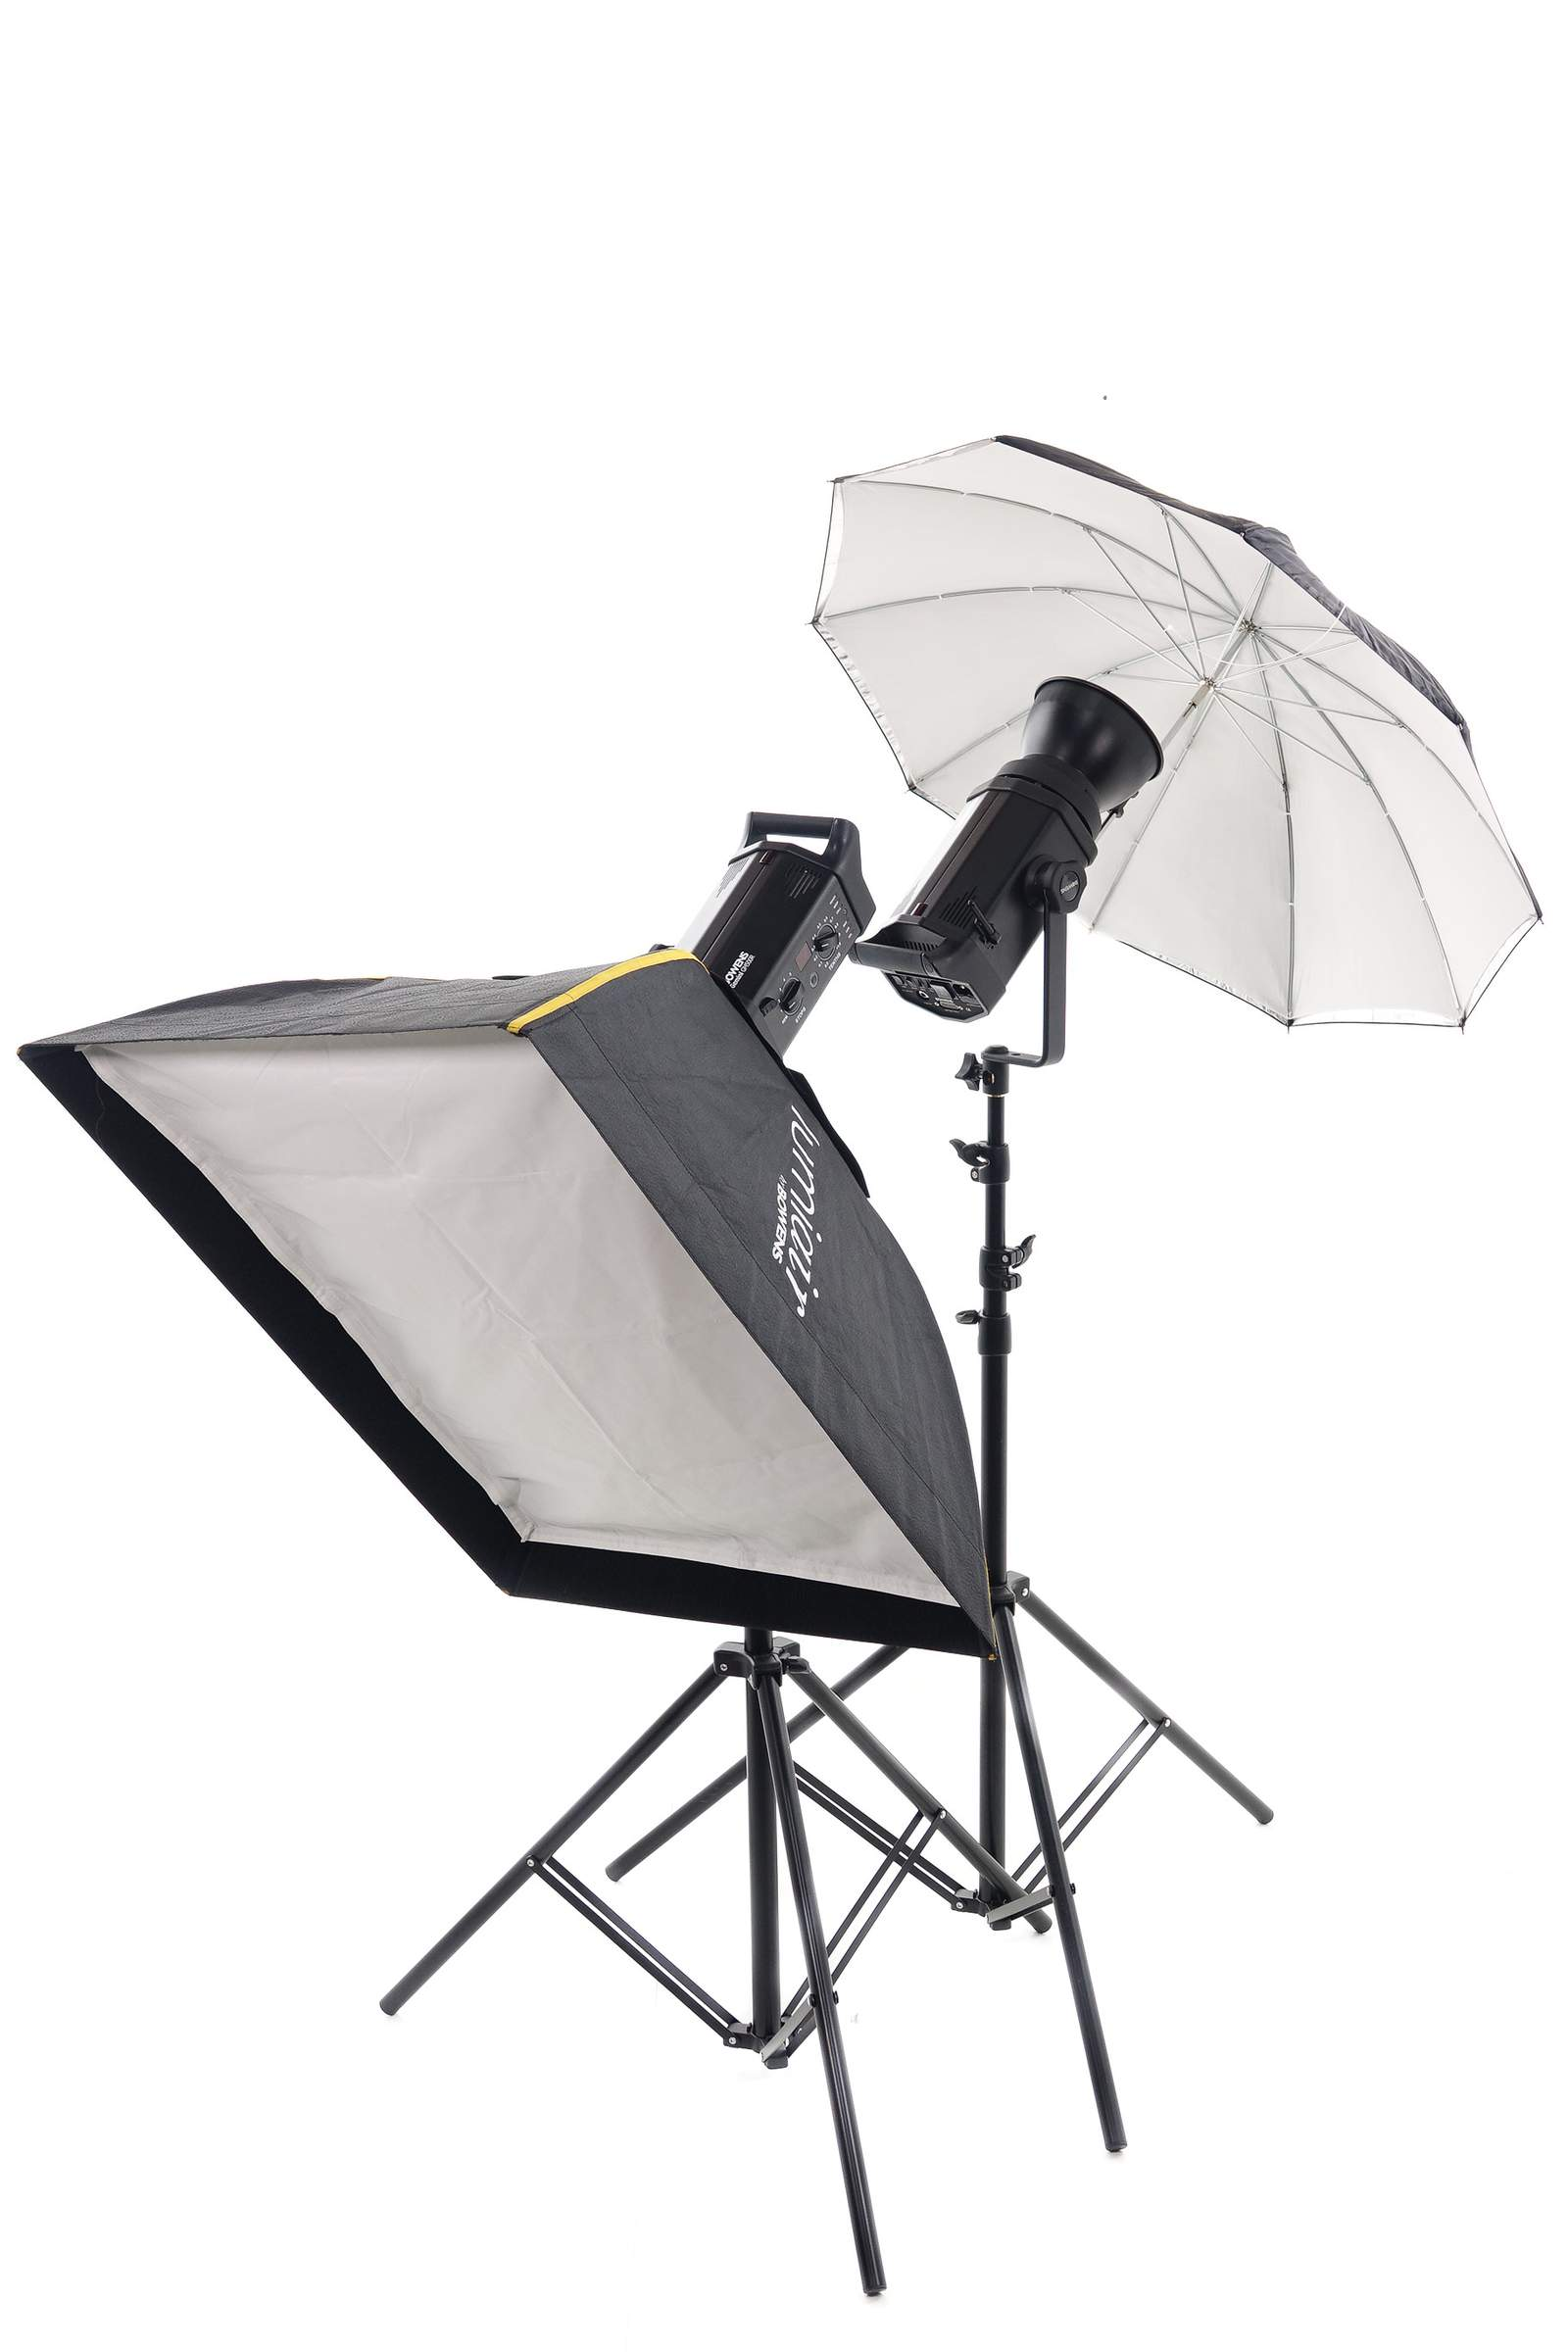 Bowens 500R TX Studio Light Kit